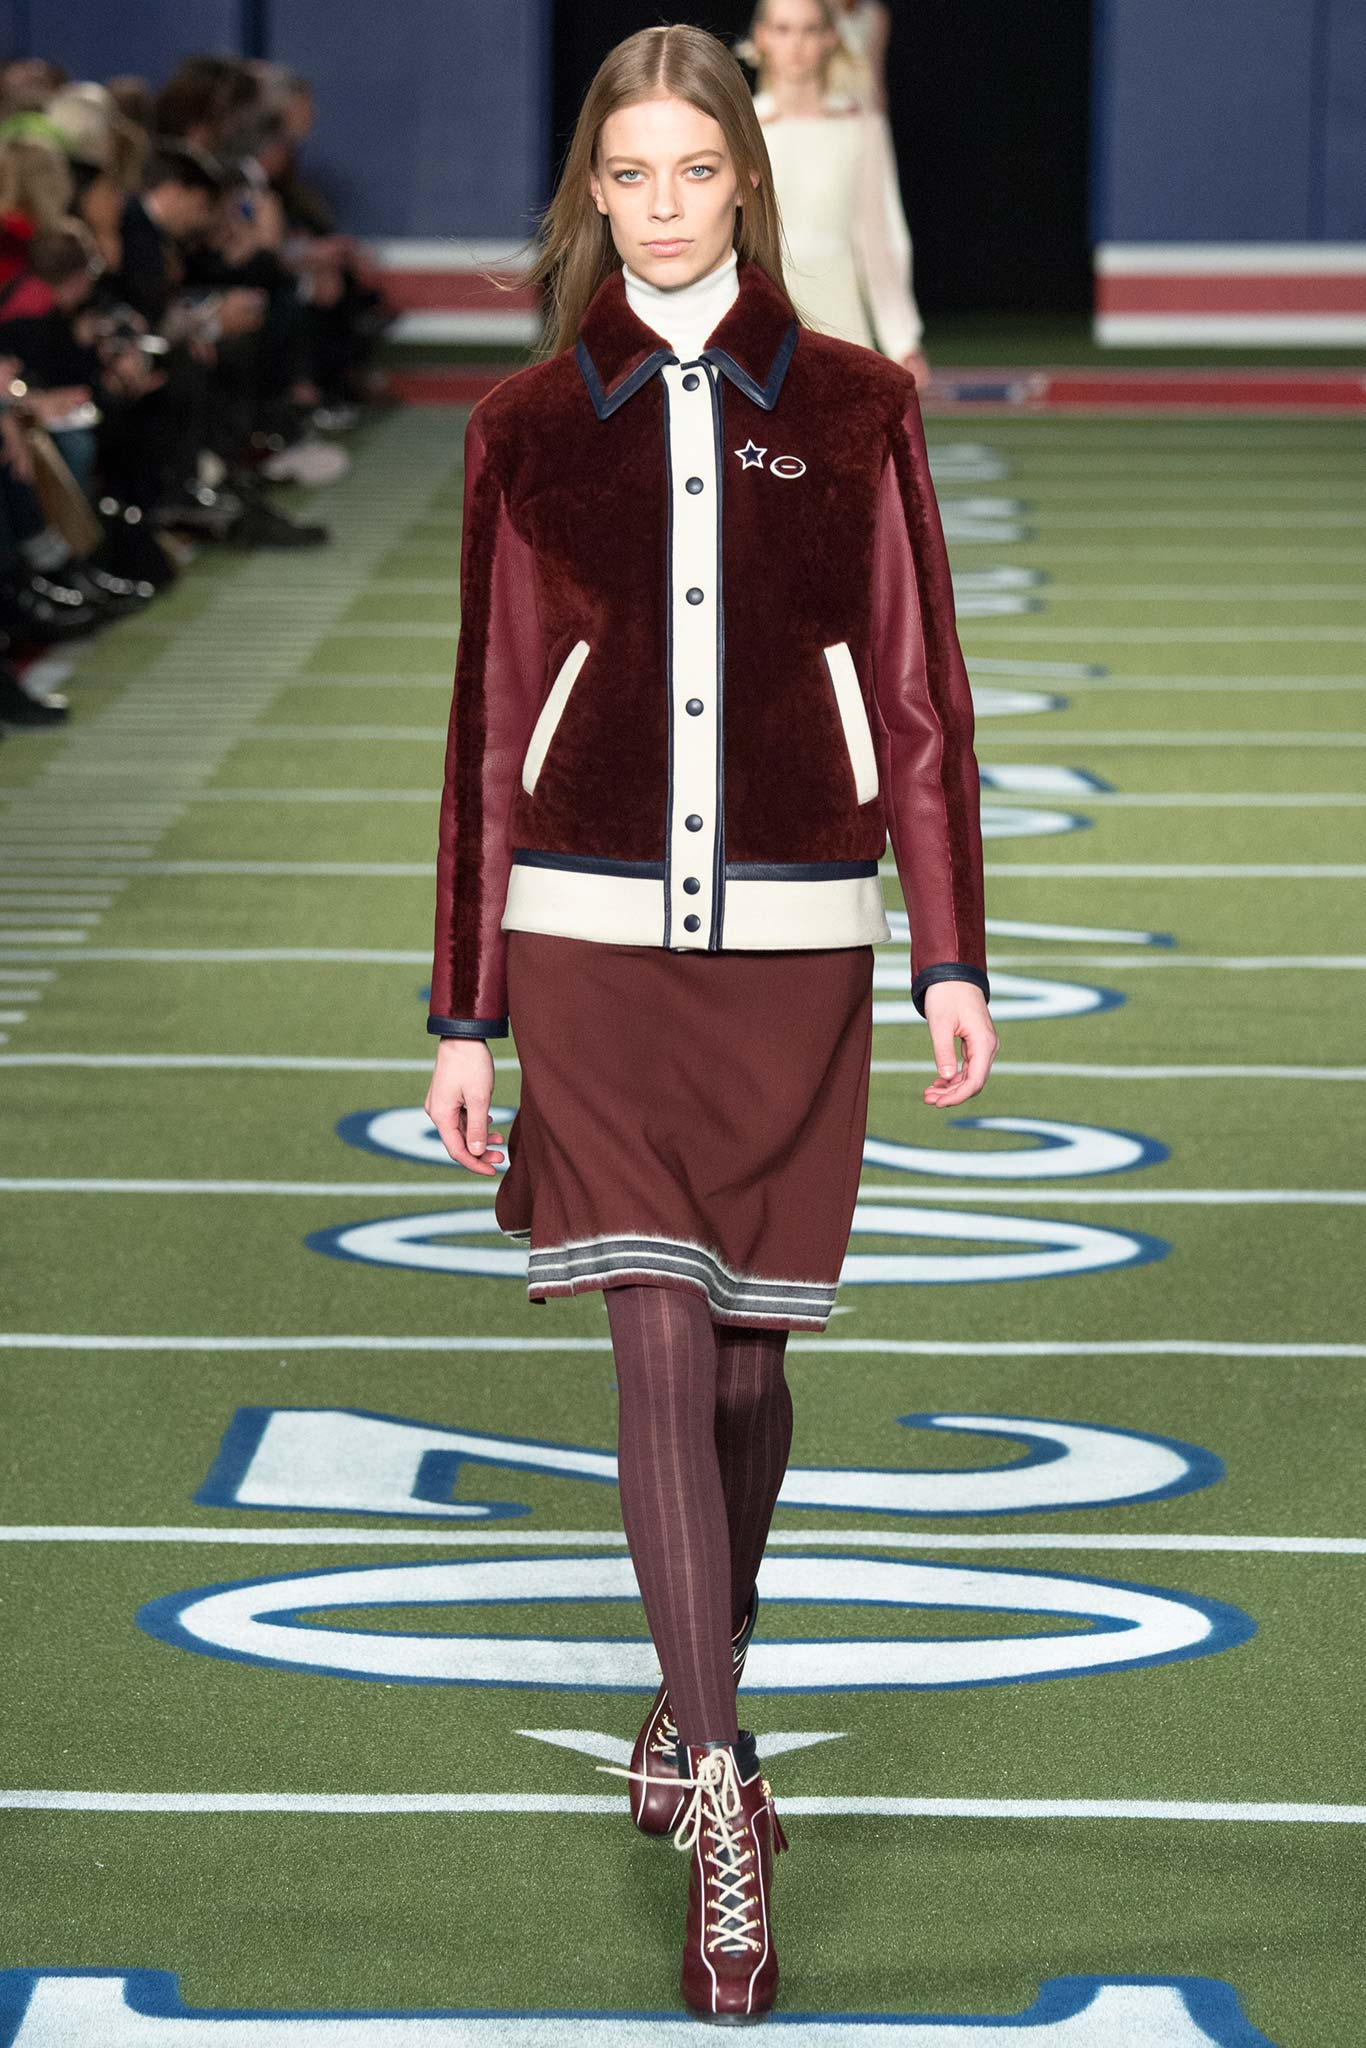 Tommy Hilfiger imagem: via style.com